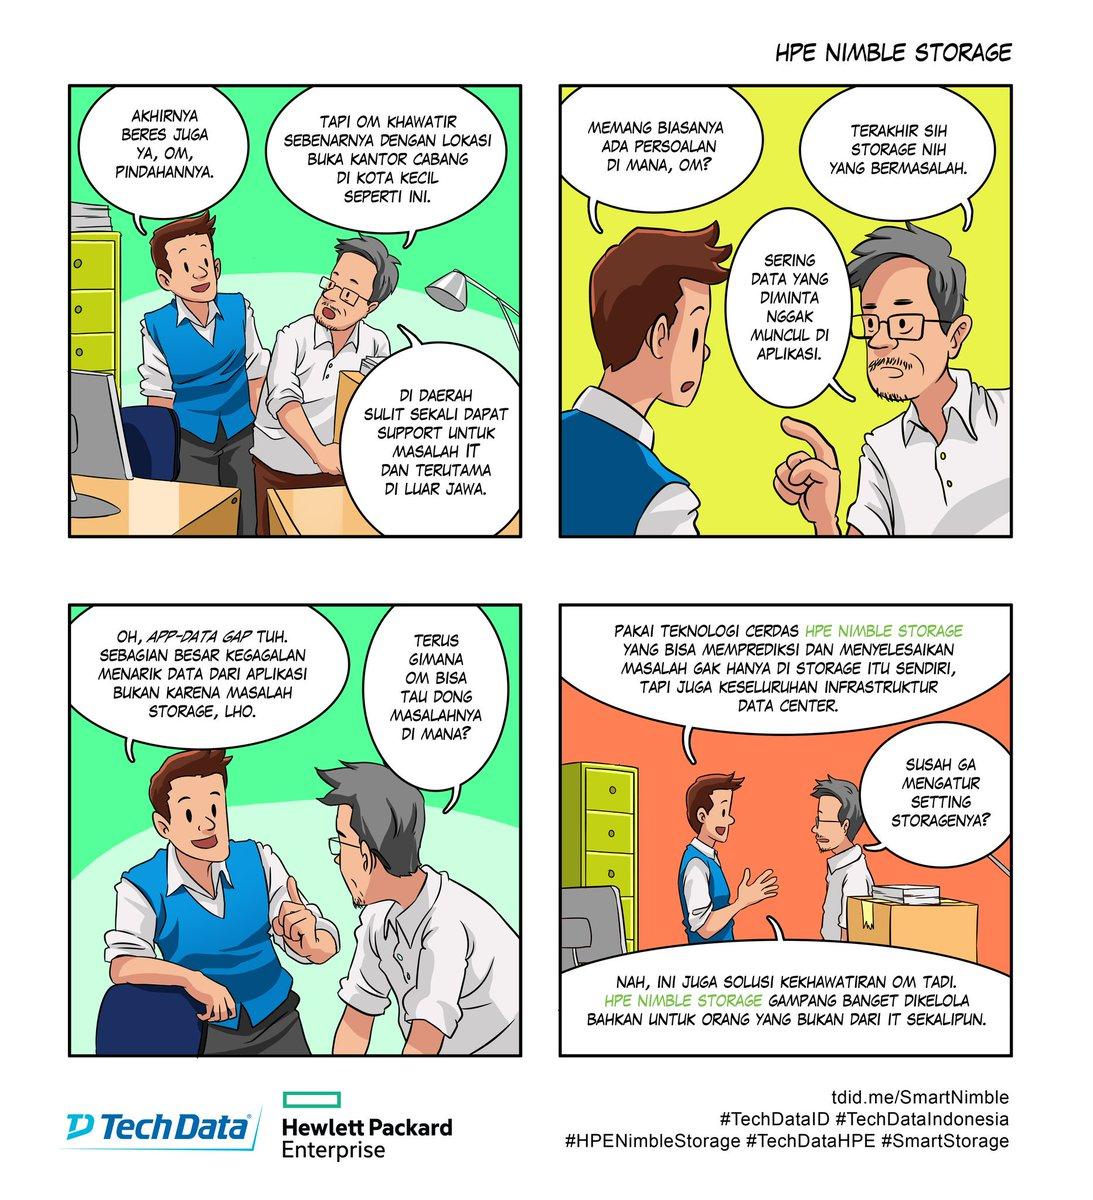 Tech Data Indonesia V Twitter Hpe Nimblestorage Adalah Flash Storage Dengan Artificialintelligence Hpeinfosight Yang Dapat Menangkal Persoalan Di Infrastruktur Ti Anda Bahkan Sebelum Terjadi Https T Co Q7pqvy2uy5 Techdatahpe Techdataid